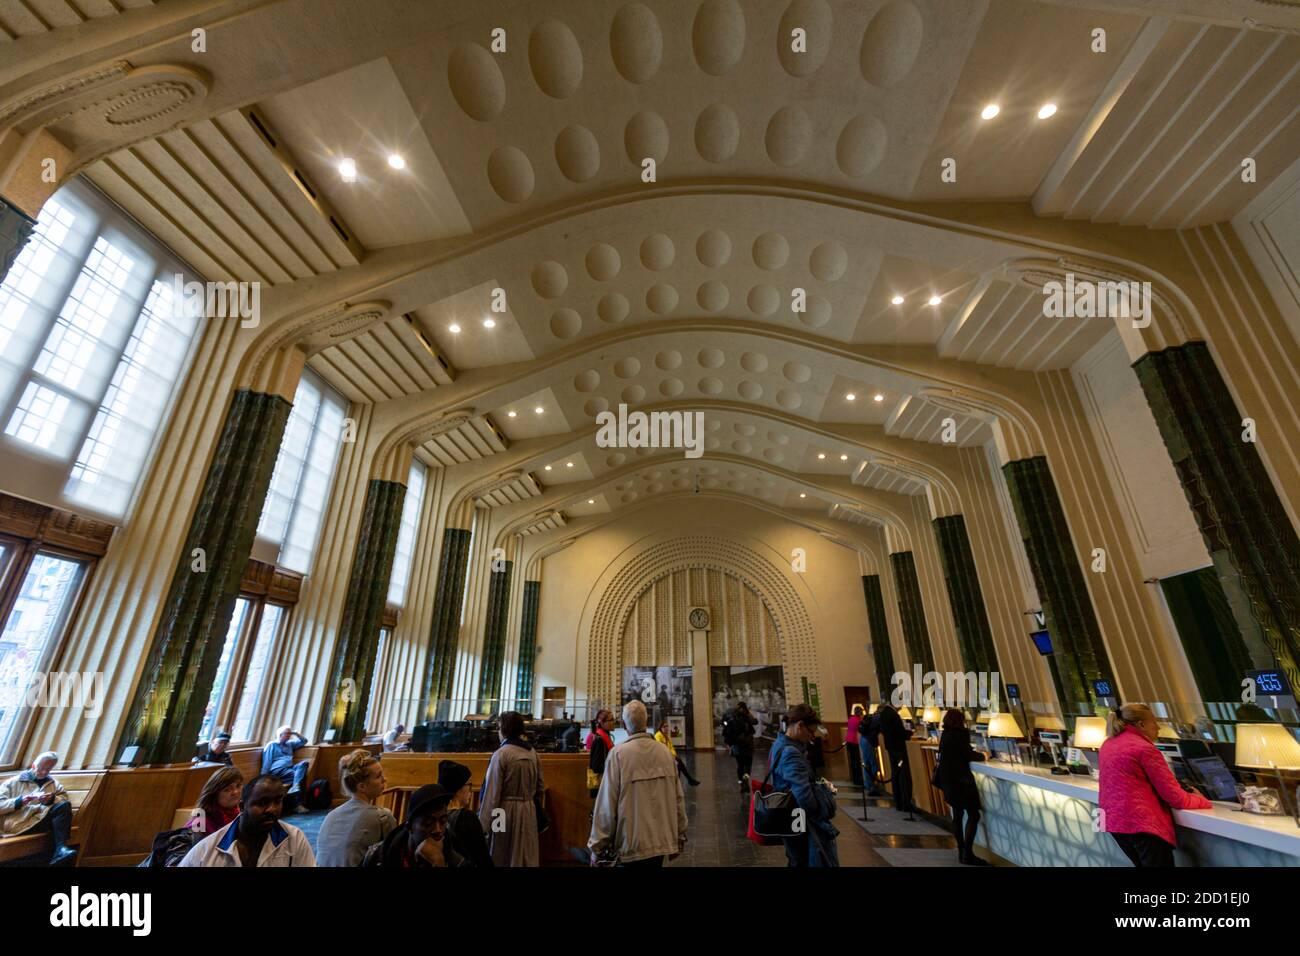 Interior of Helsinki Central Station, Helsinki, Finland Stock Photo